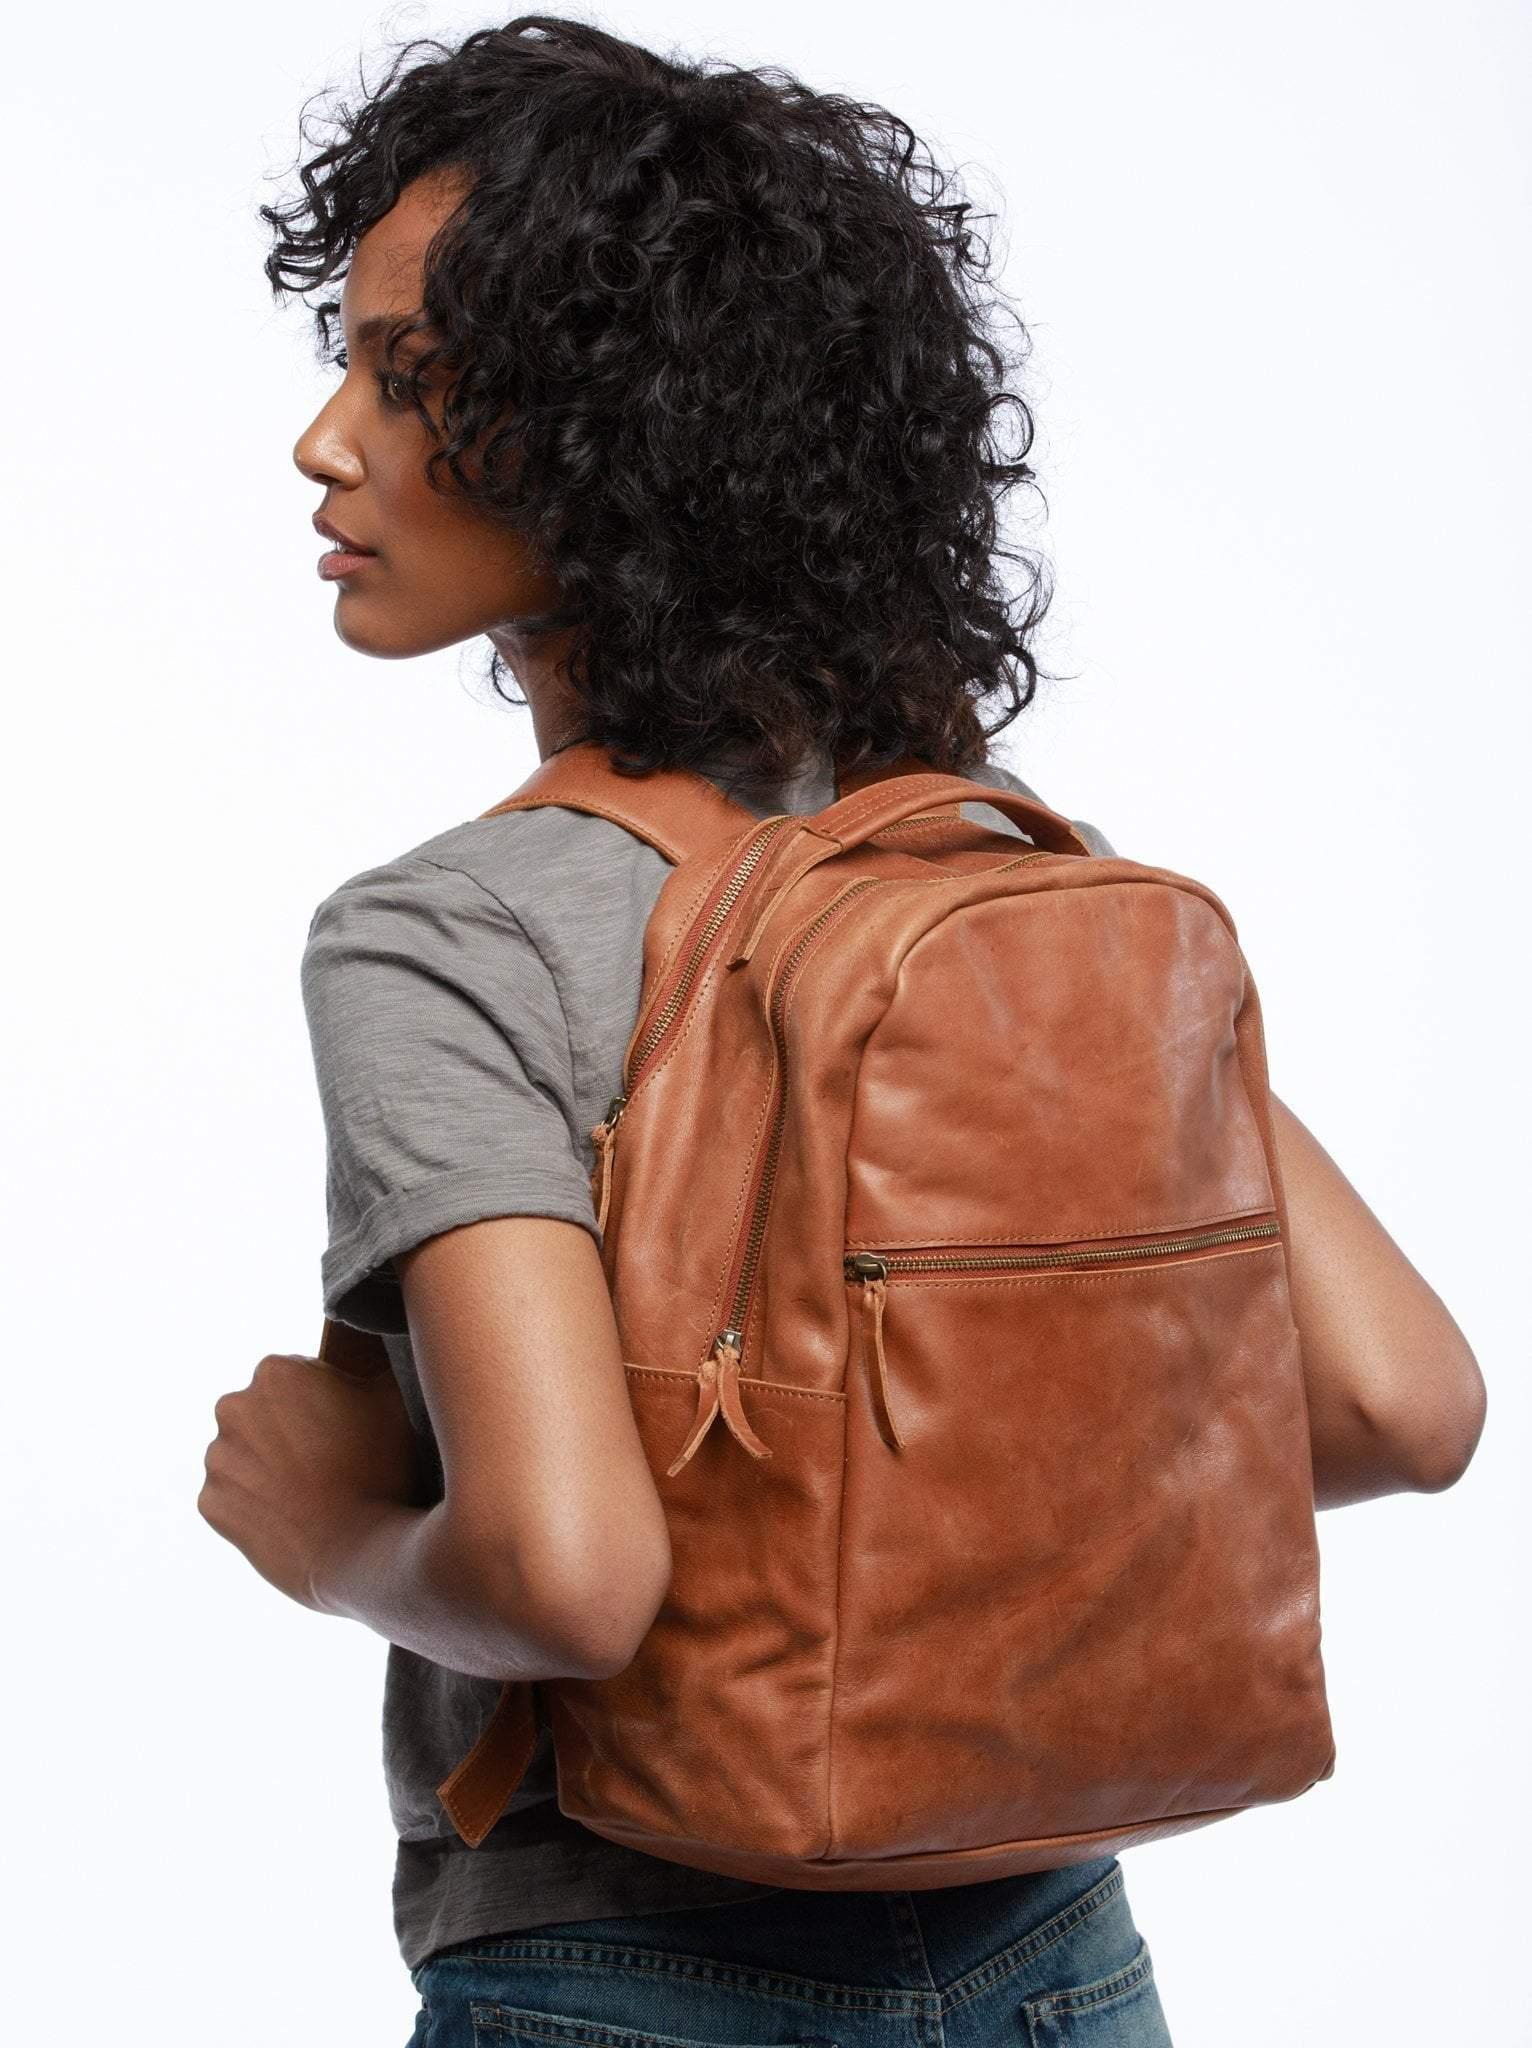 Ethically Made Backpacks